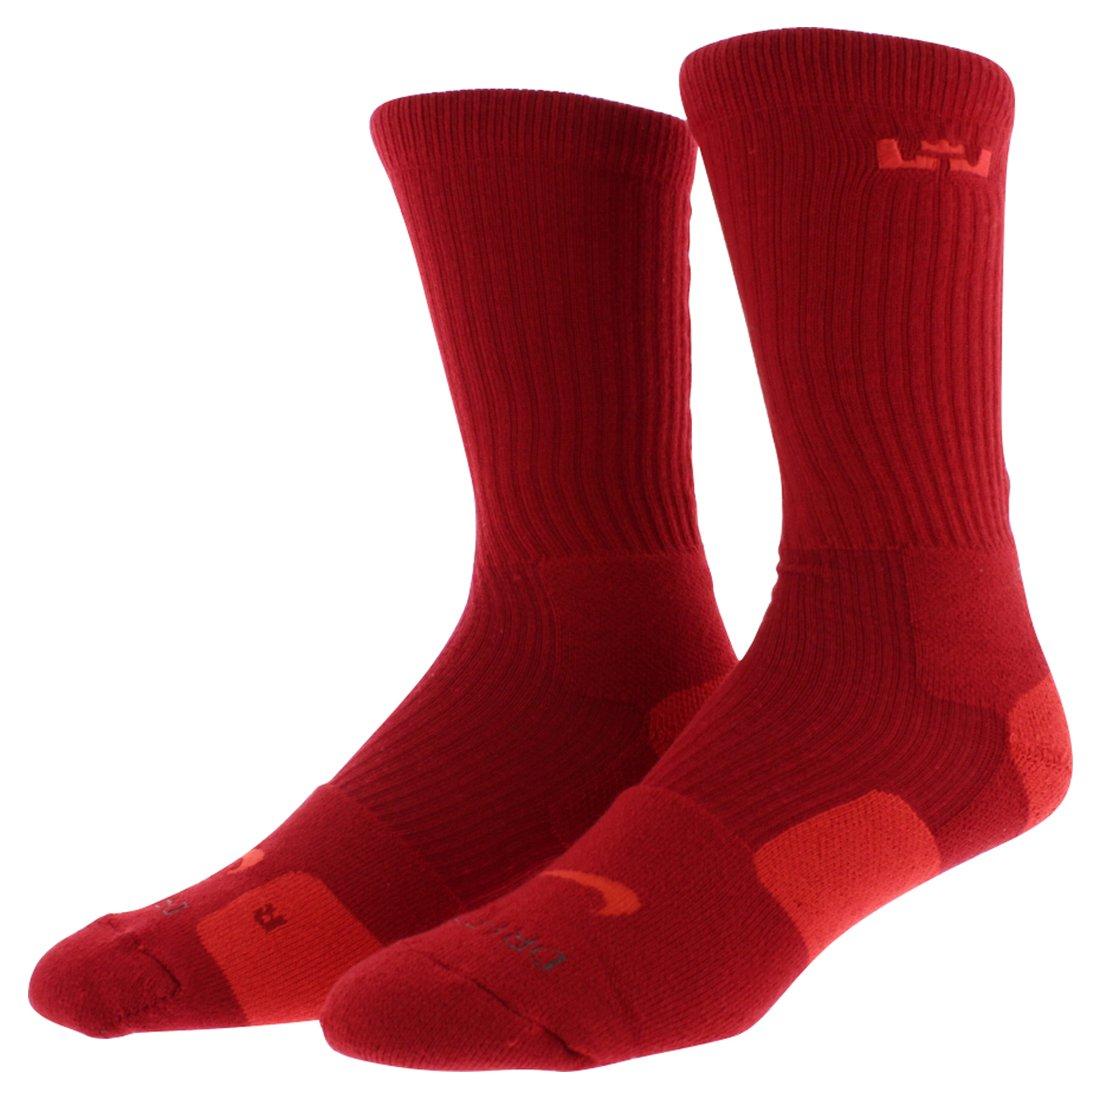 Men 's Nike LeBronクッションEliteクルーバスケットボールソックス L B00OPGT5MY